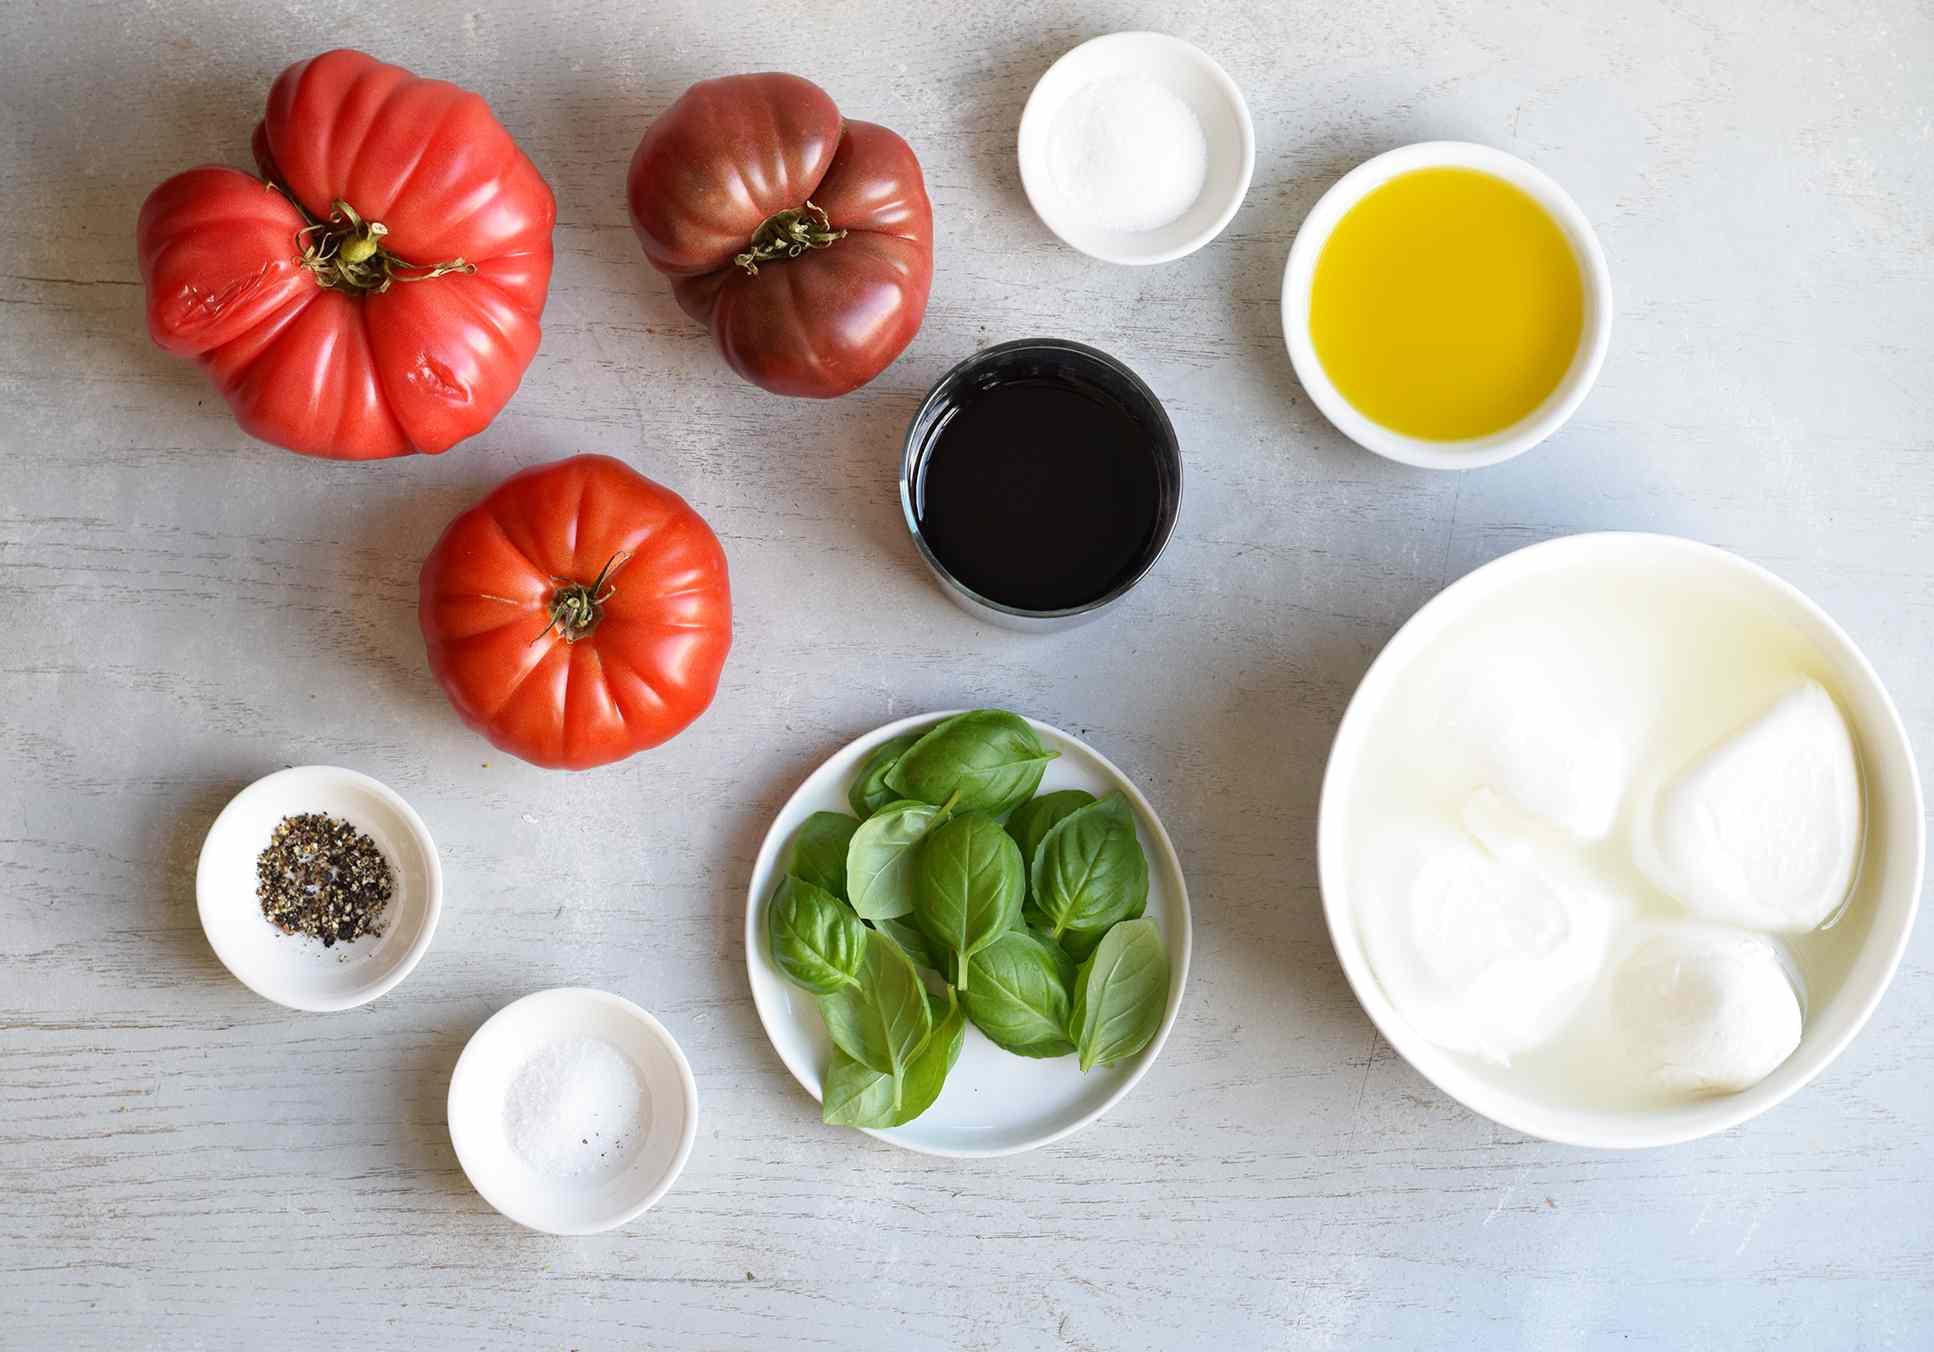 caprese salad ingredients on a board